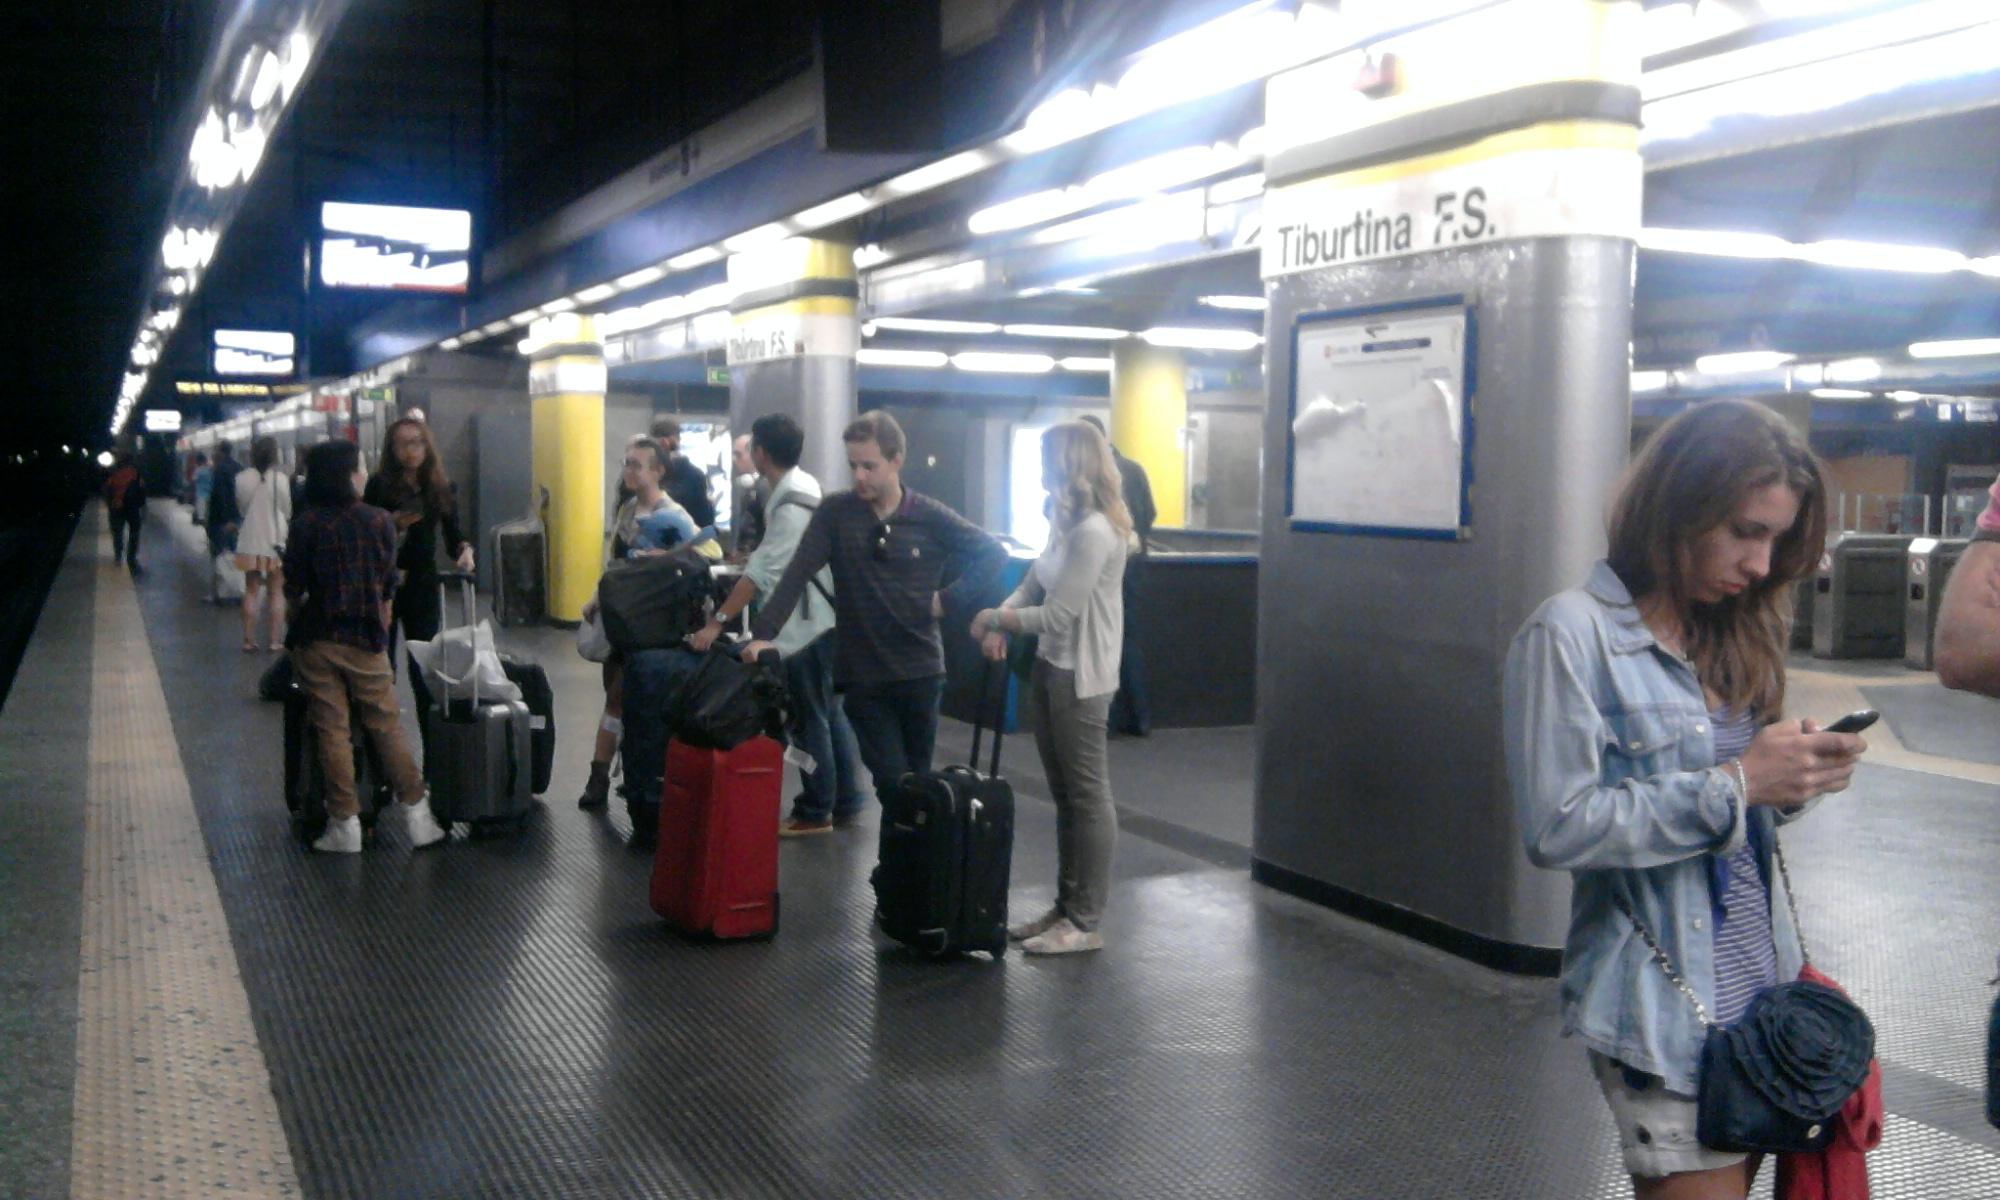 Tiburtina Rome Metro Wikipedia